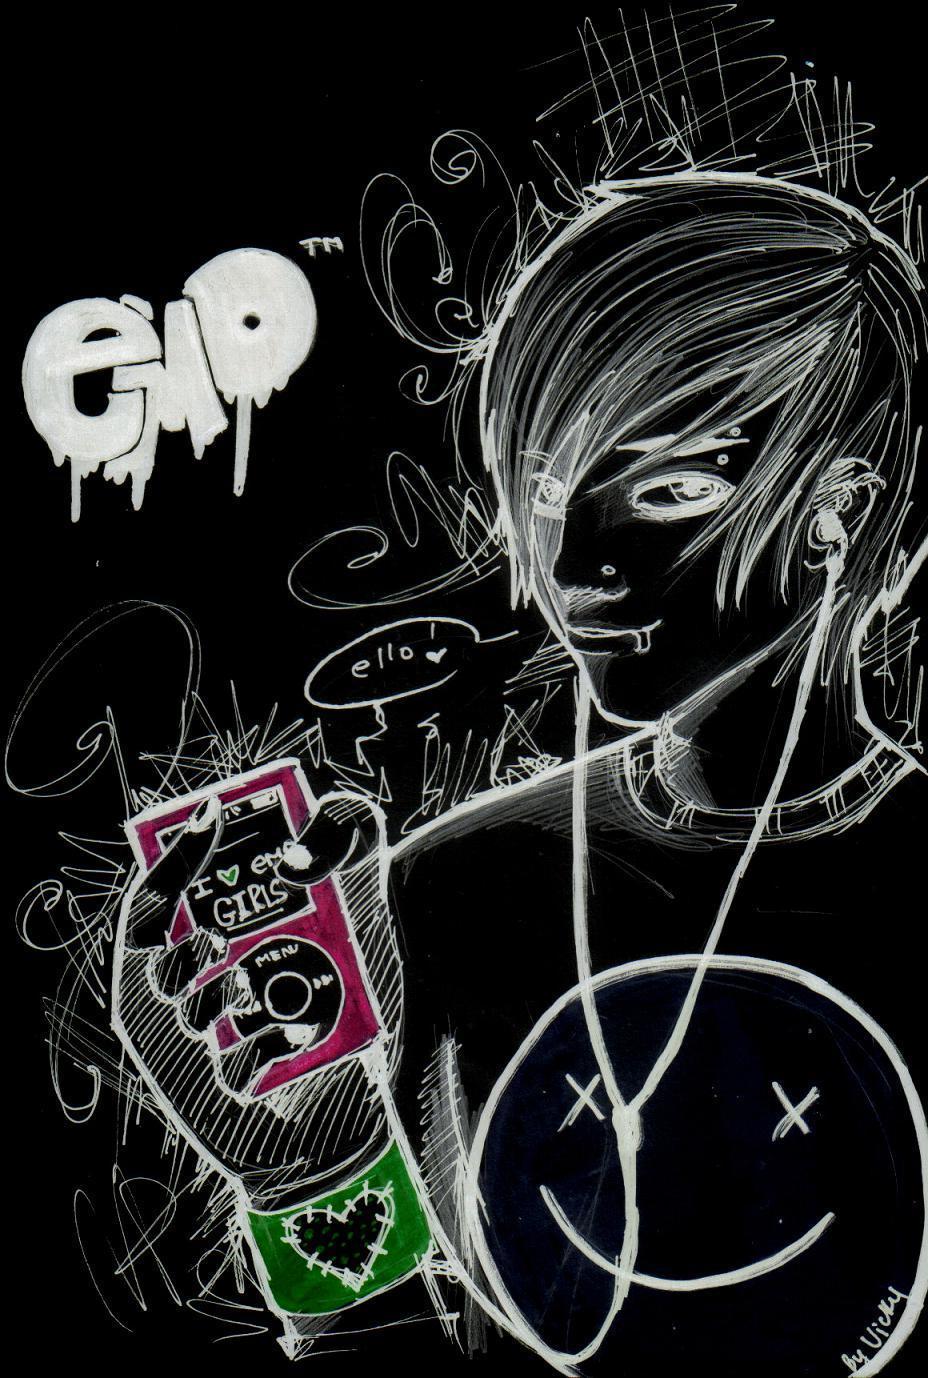 Emo Love cartoon Wallpaper : Emo Love Wallpapers 2016 - Wallpaper cave